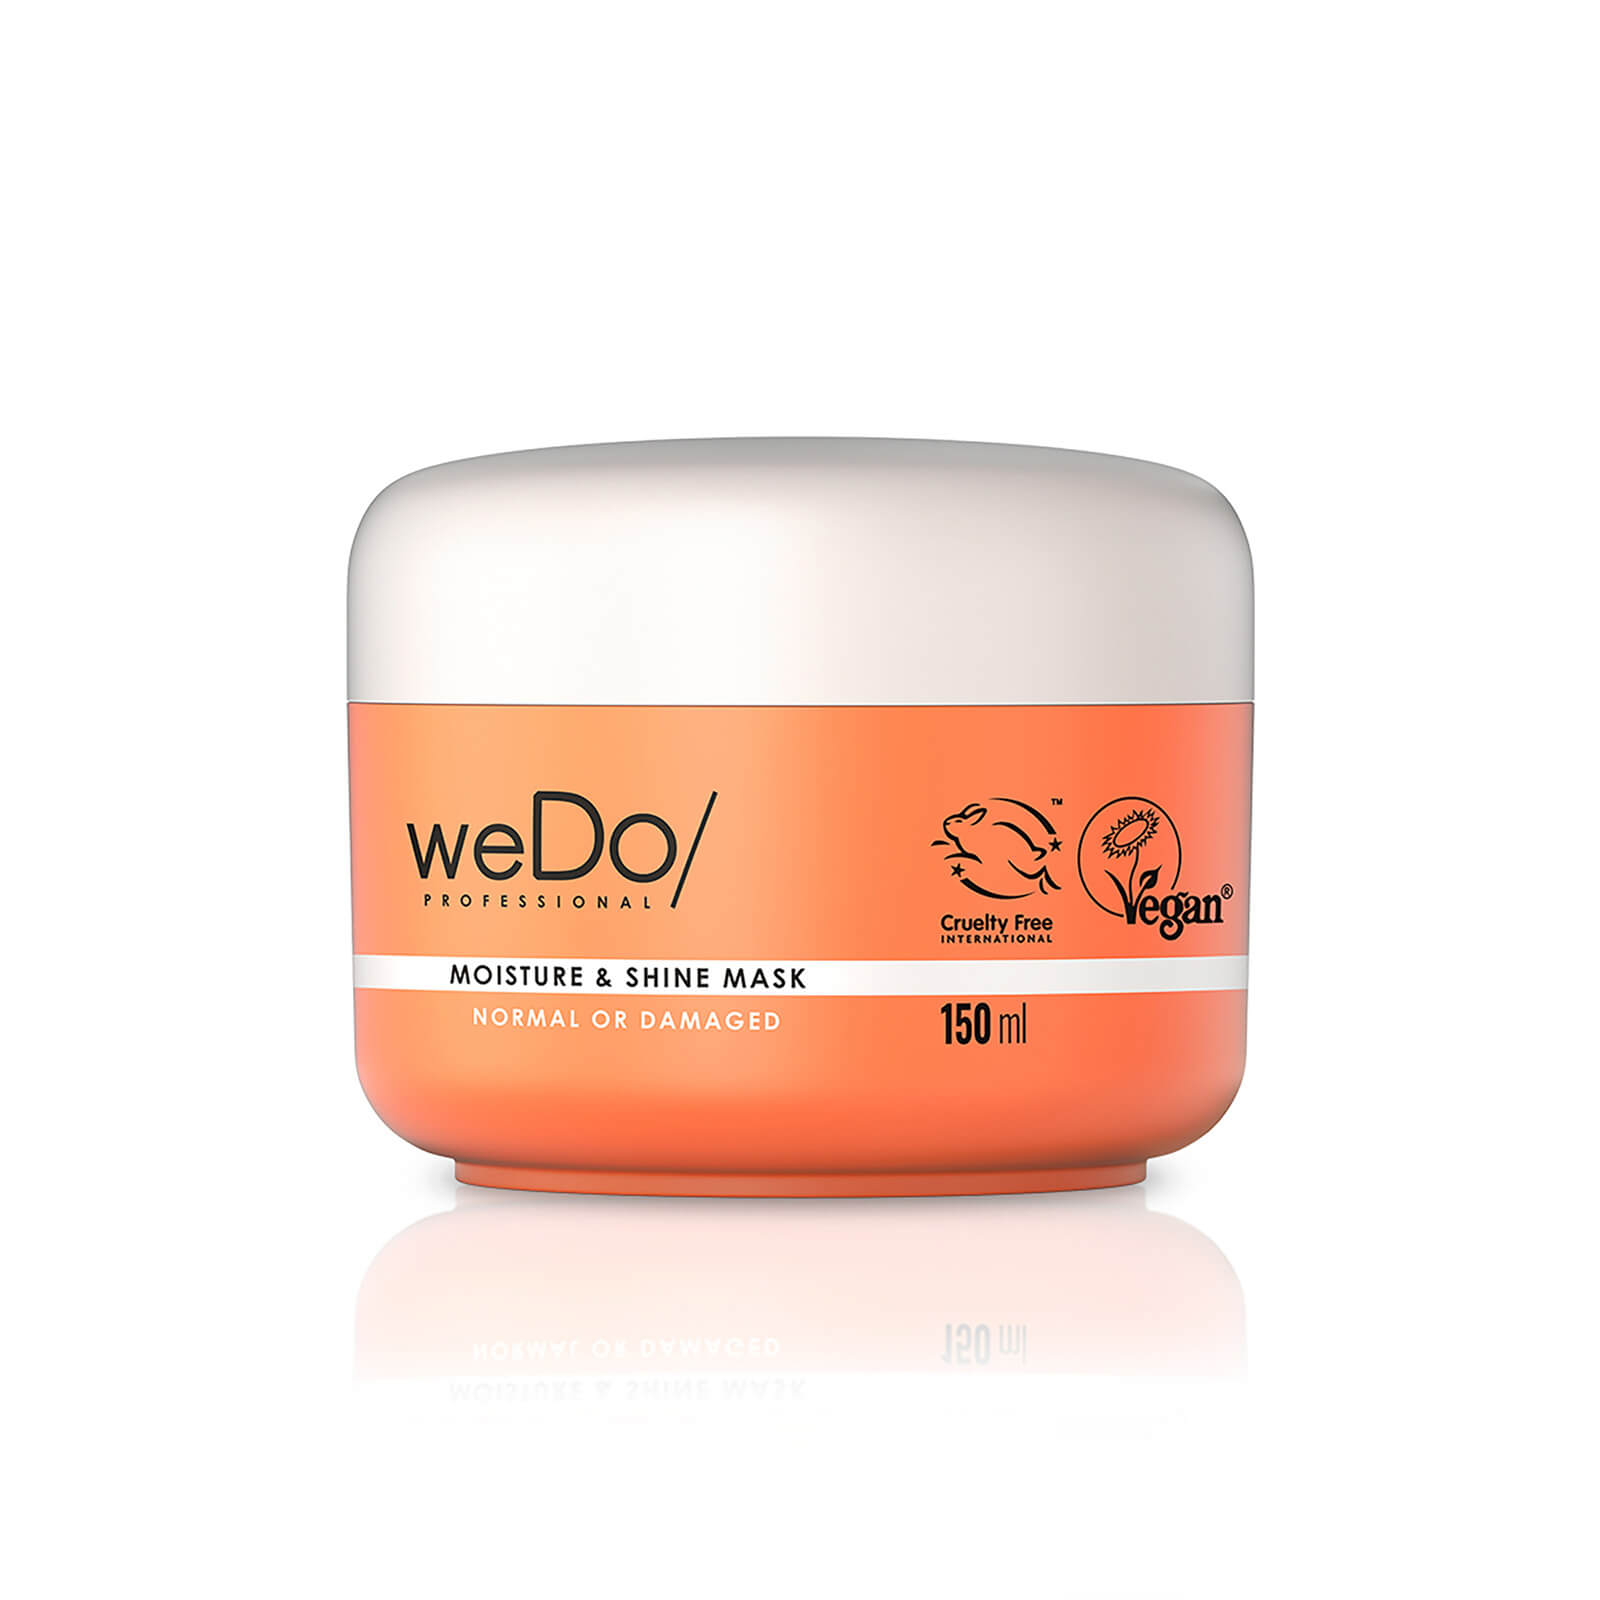 weDo/ Professional Moisture and Shine Mask 150ml